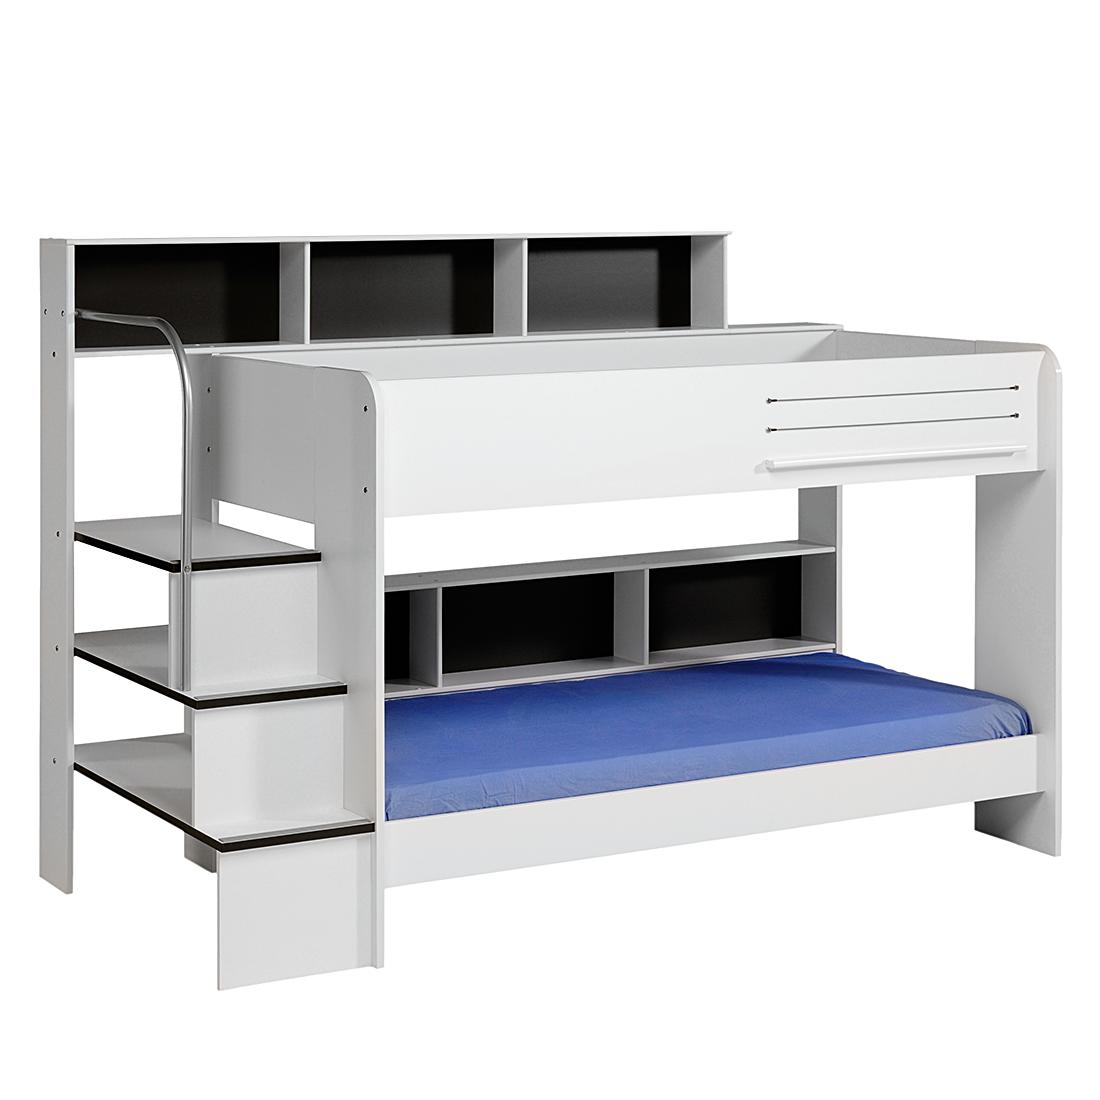 parisot meubles stapelbed bibop draaibare achterwand. Black Bedroom Furniture Sets. Home Design Ideas